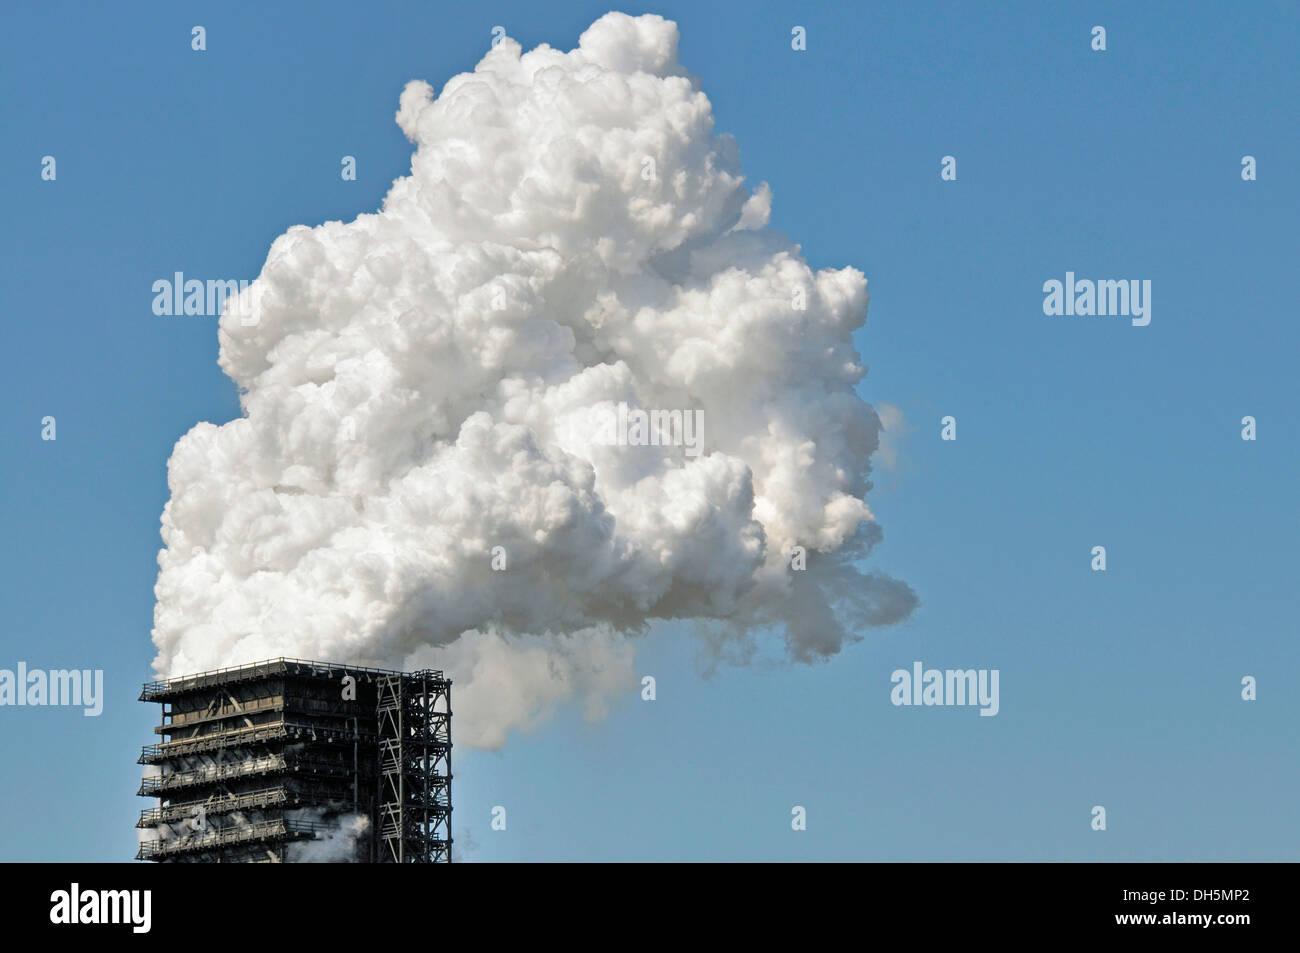 Torre de enfriamiento húmedo norte proyecto Kokerei Schwelgern, planta de coquización, ThyssenKrupp Steel Works en Hamborn, Duisburg Imagen De Stock